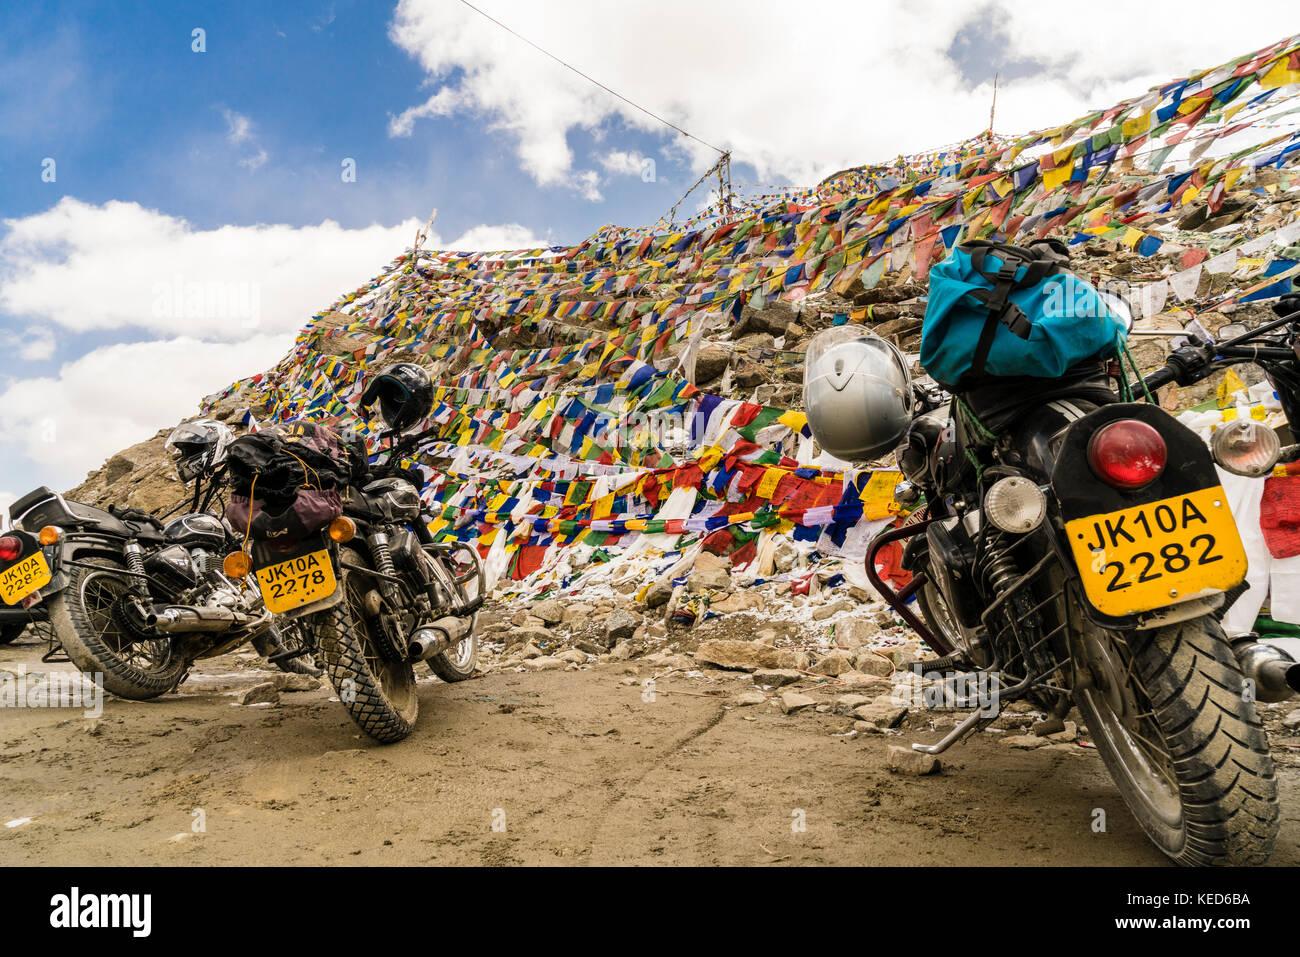 Motorcycles on the highest navigable road at Khardungla Top, Ladakh, India Stock Photo